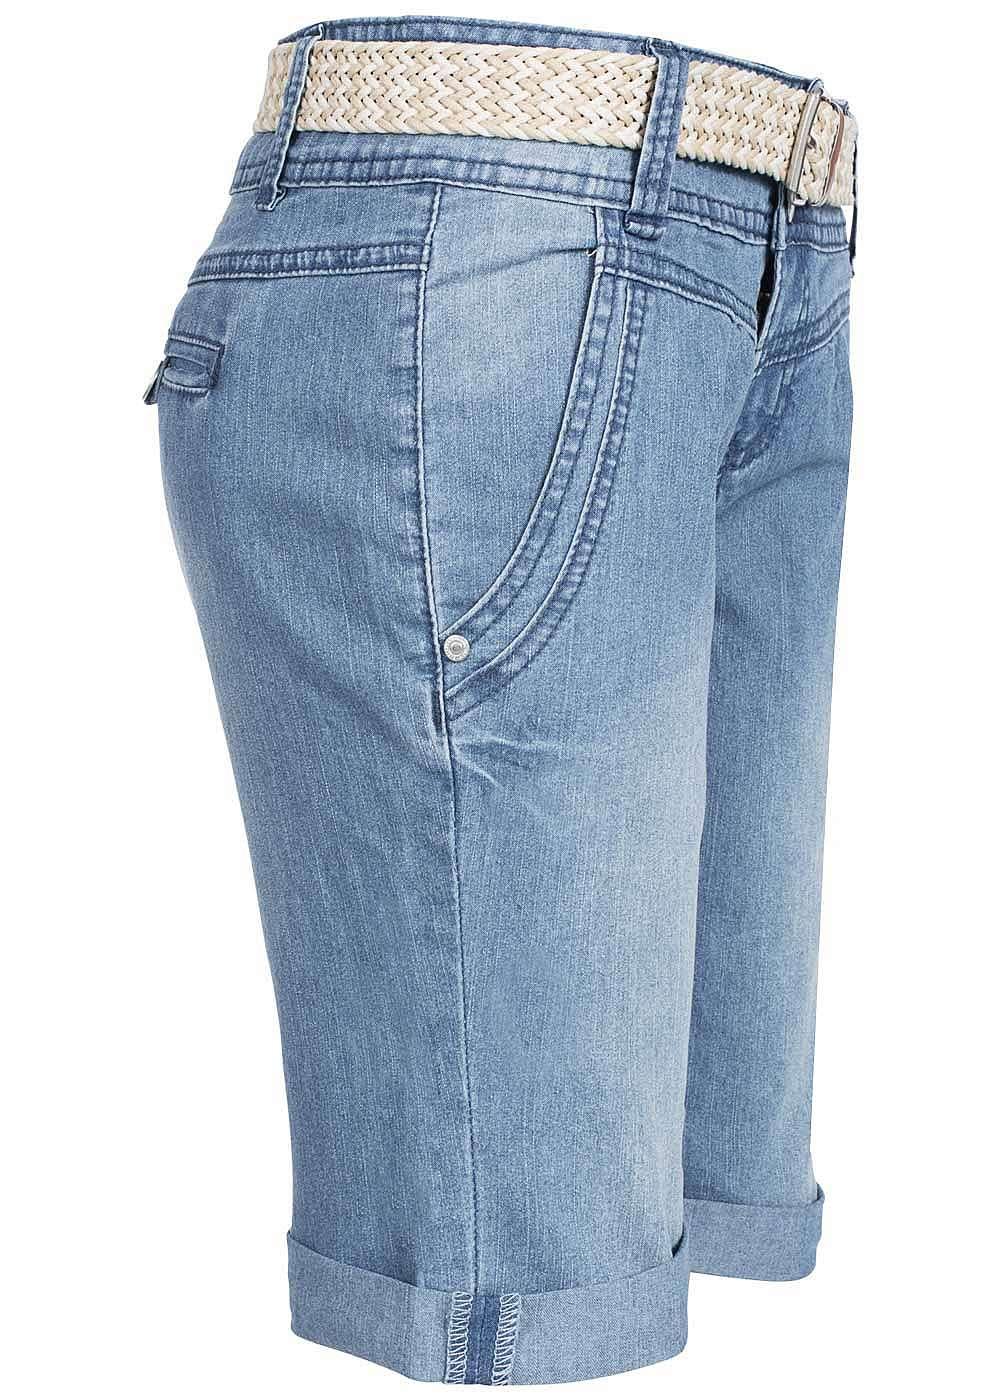 eight2nine damen jeans bermuda short g rtel 4 pockets by sublevel medium blau denim 77onlineshop. Black Bedroom Furniture Sets. Home Design Ideas